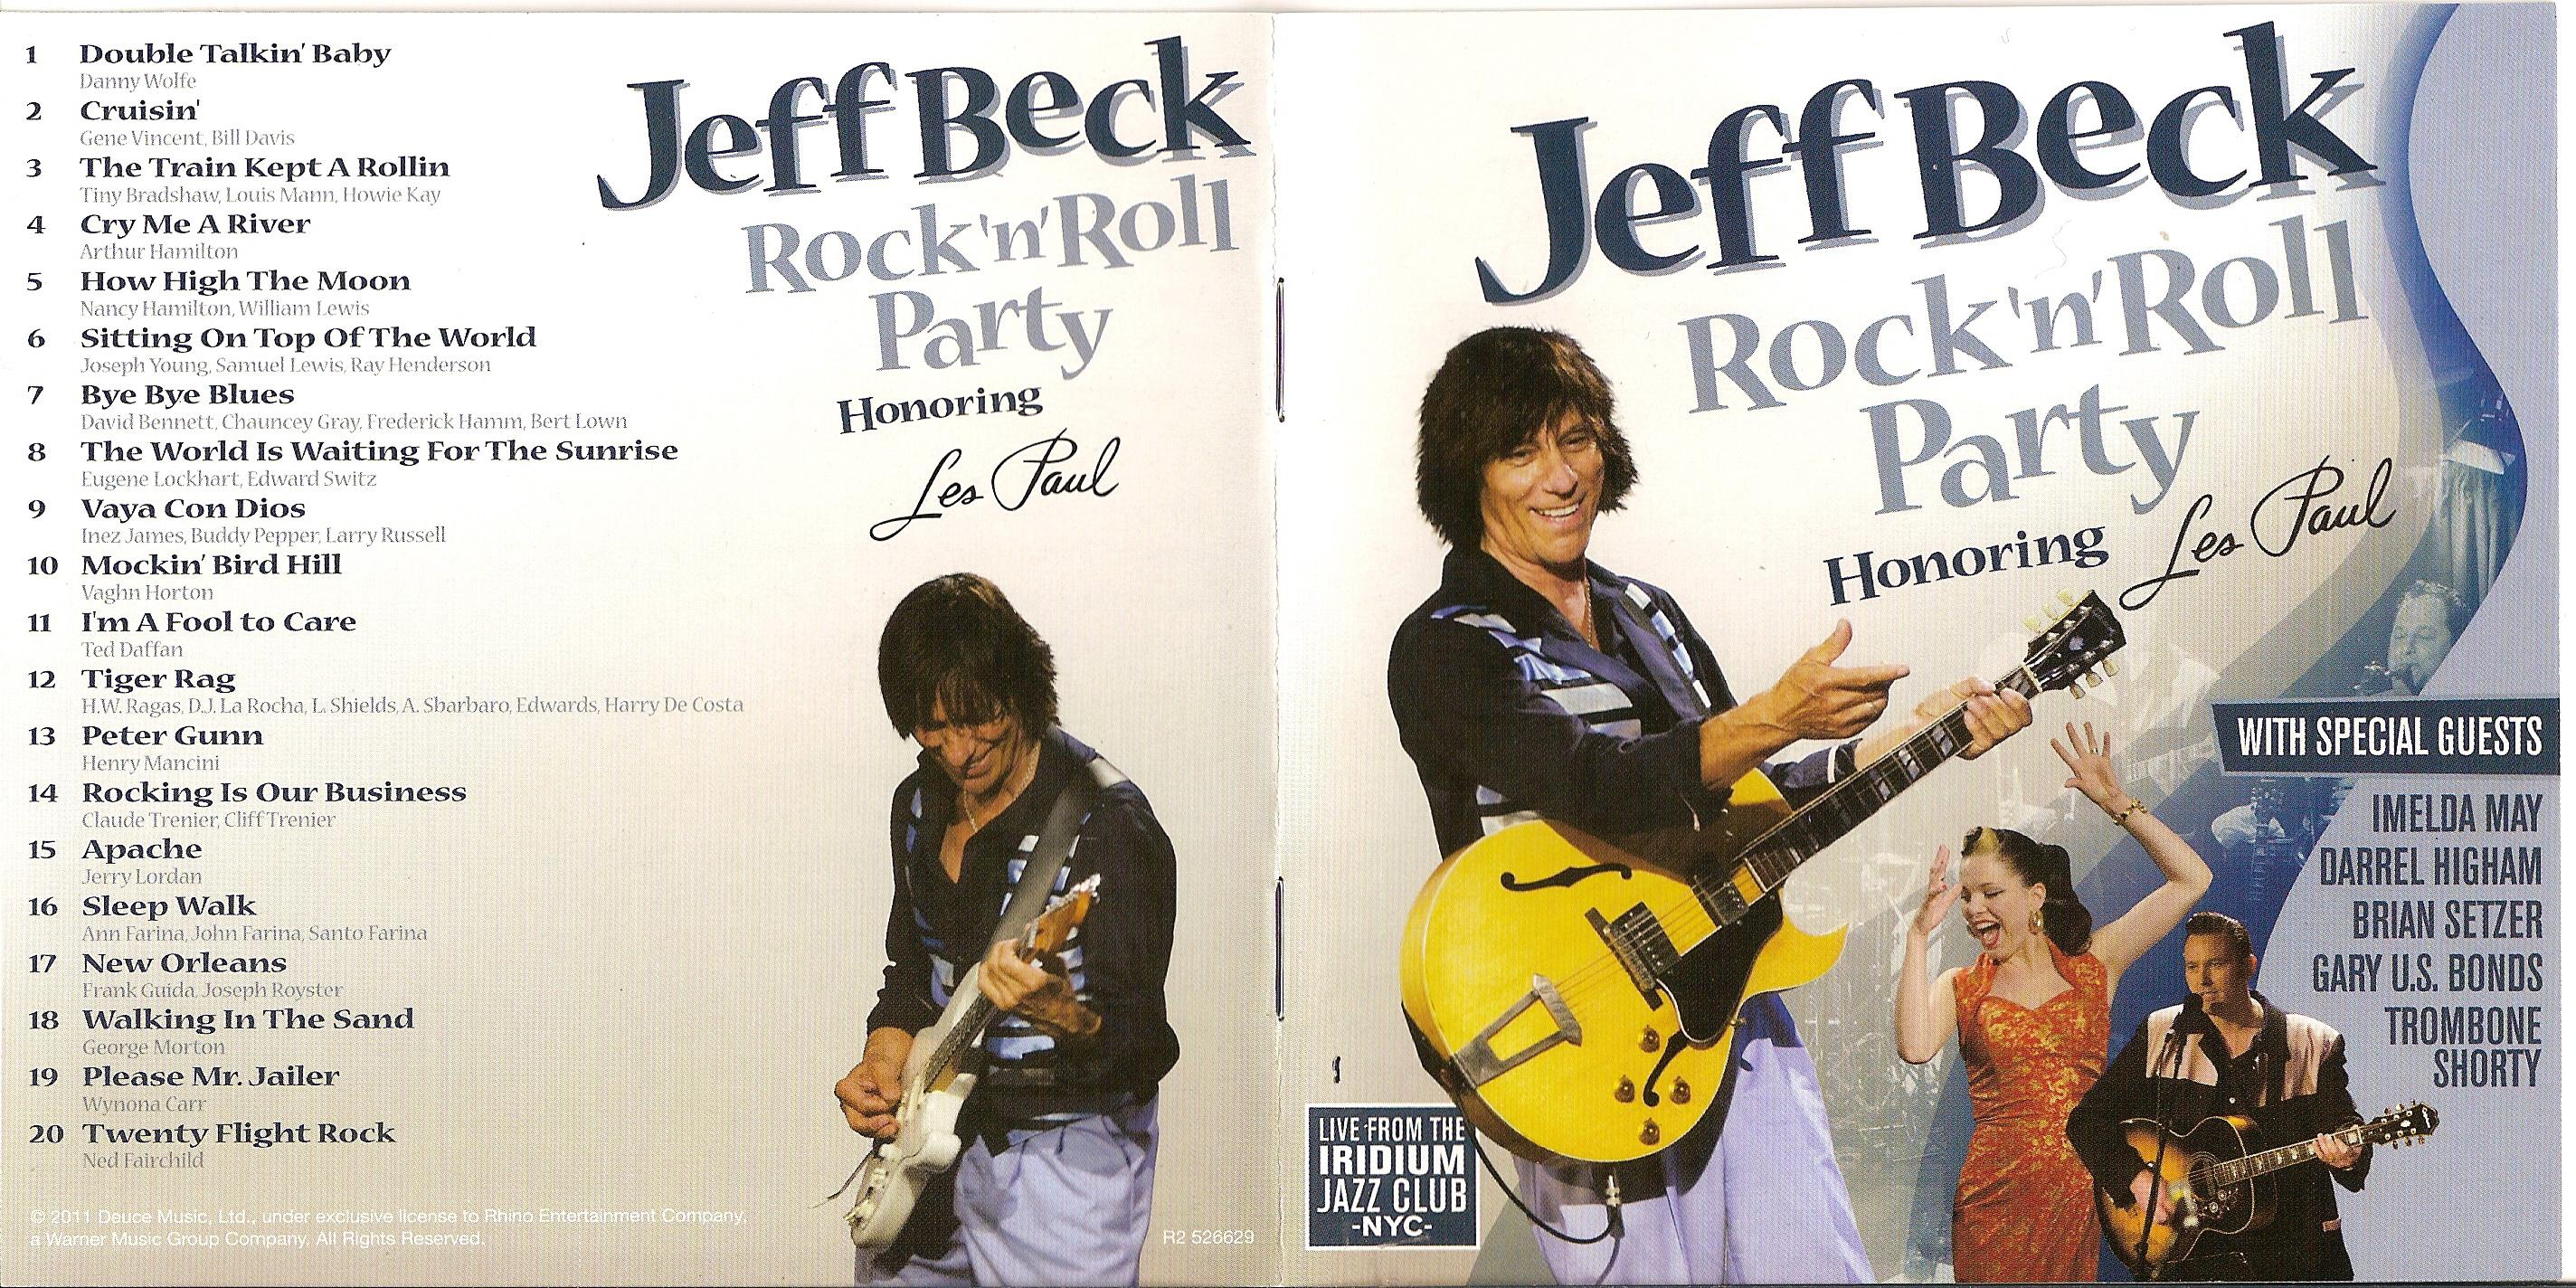 Jeff Beck - Rock 'n' Roll Party: Honouring Les Paul